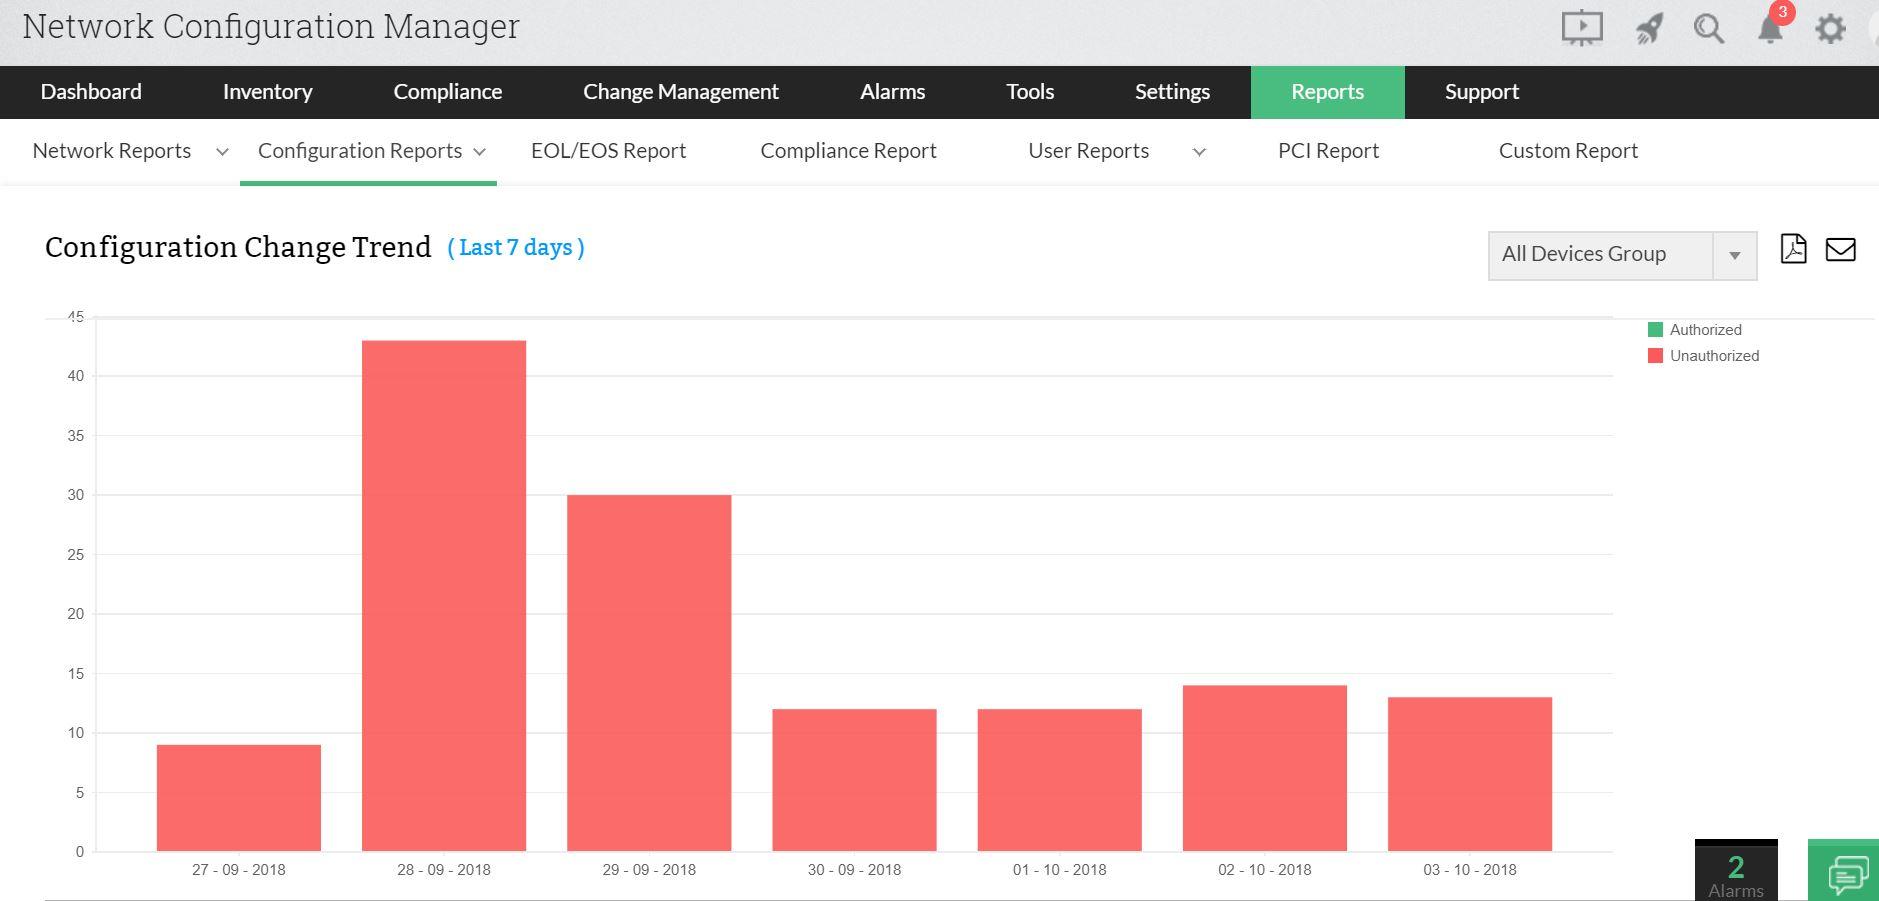 NCM Reports